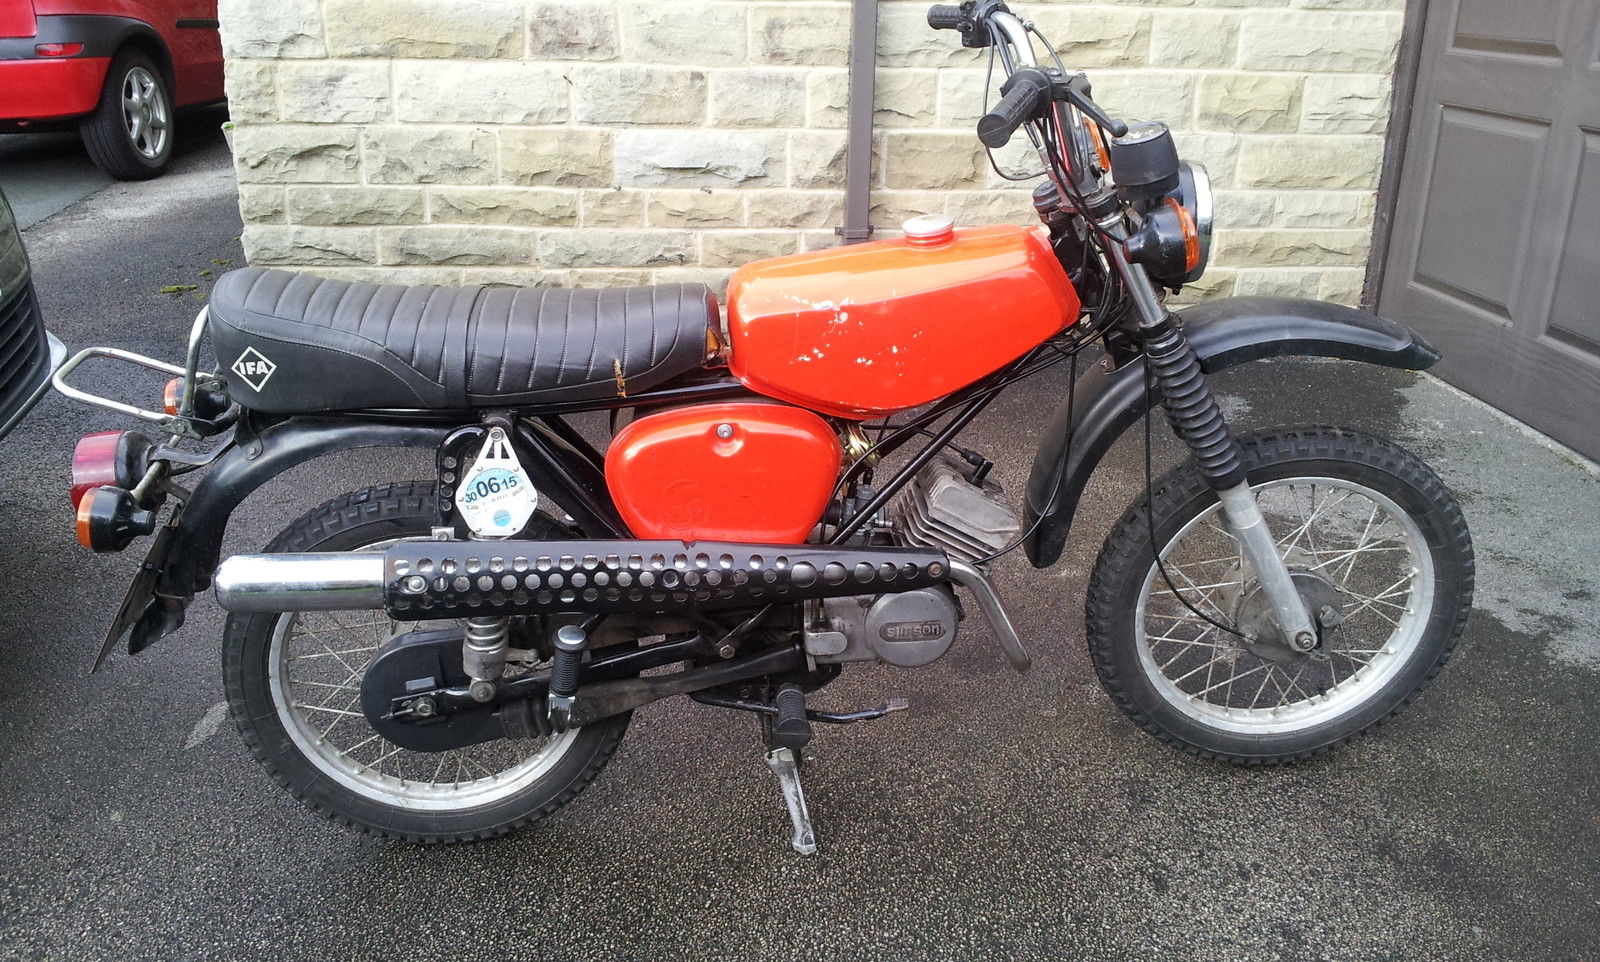 mz simson s51 enduro moped 49cc plus spares retro learner. Black Bedroom Furniture Sets. Home Design Ideas